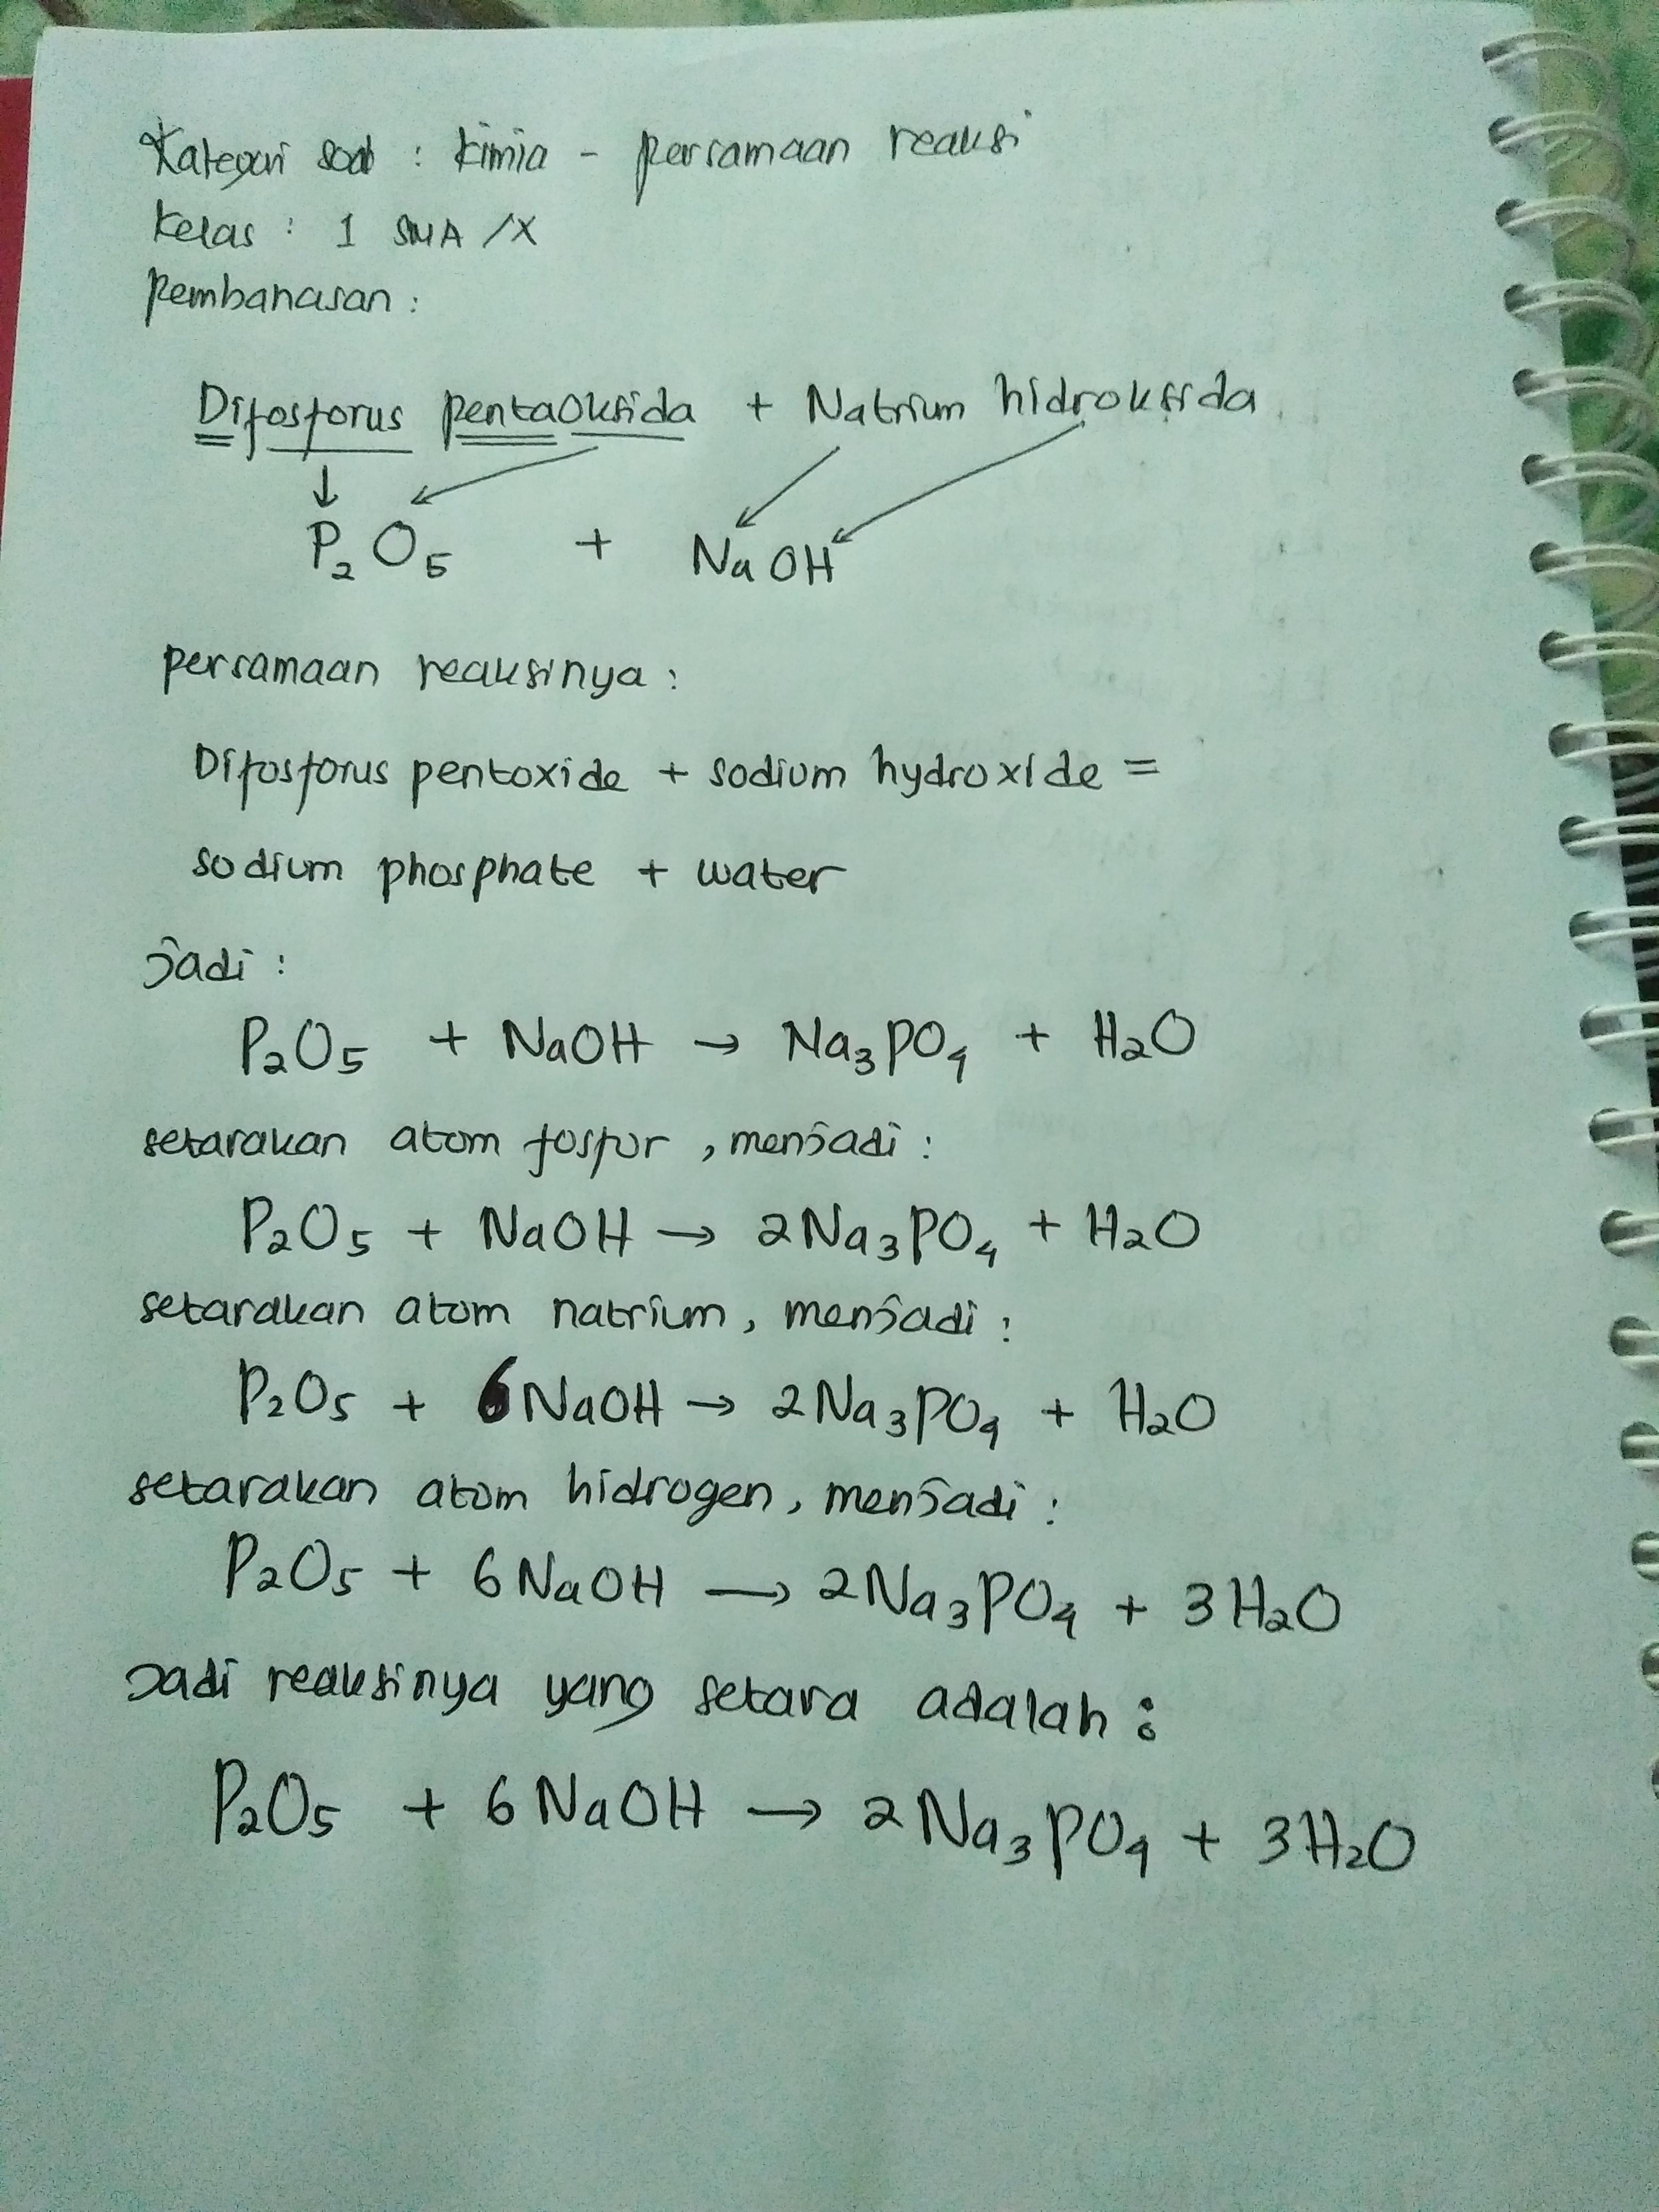 Difosforus Pentaoksida Natrium Hidroksida Brainly Co Id